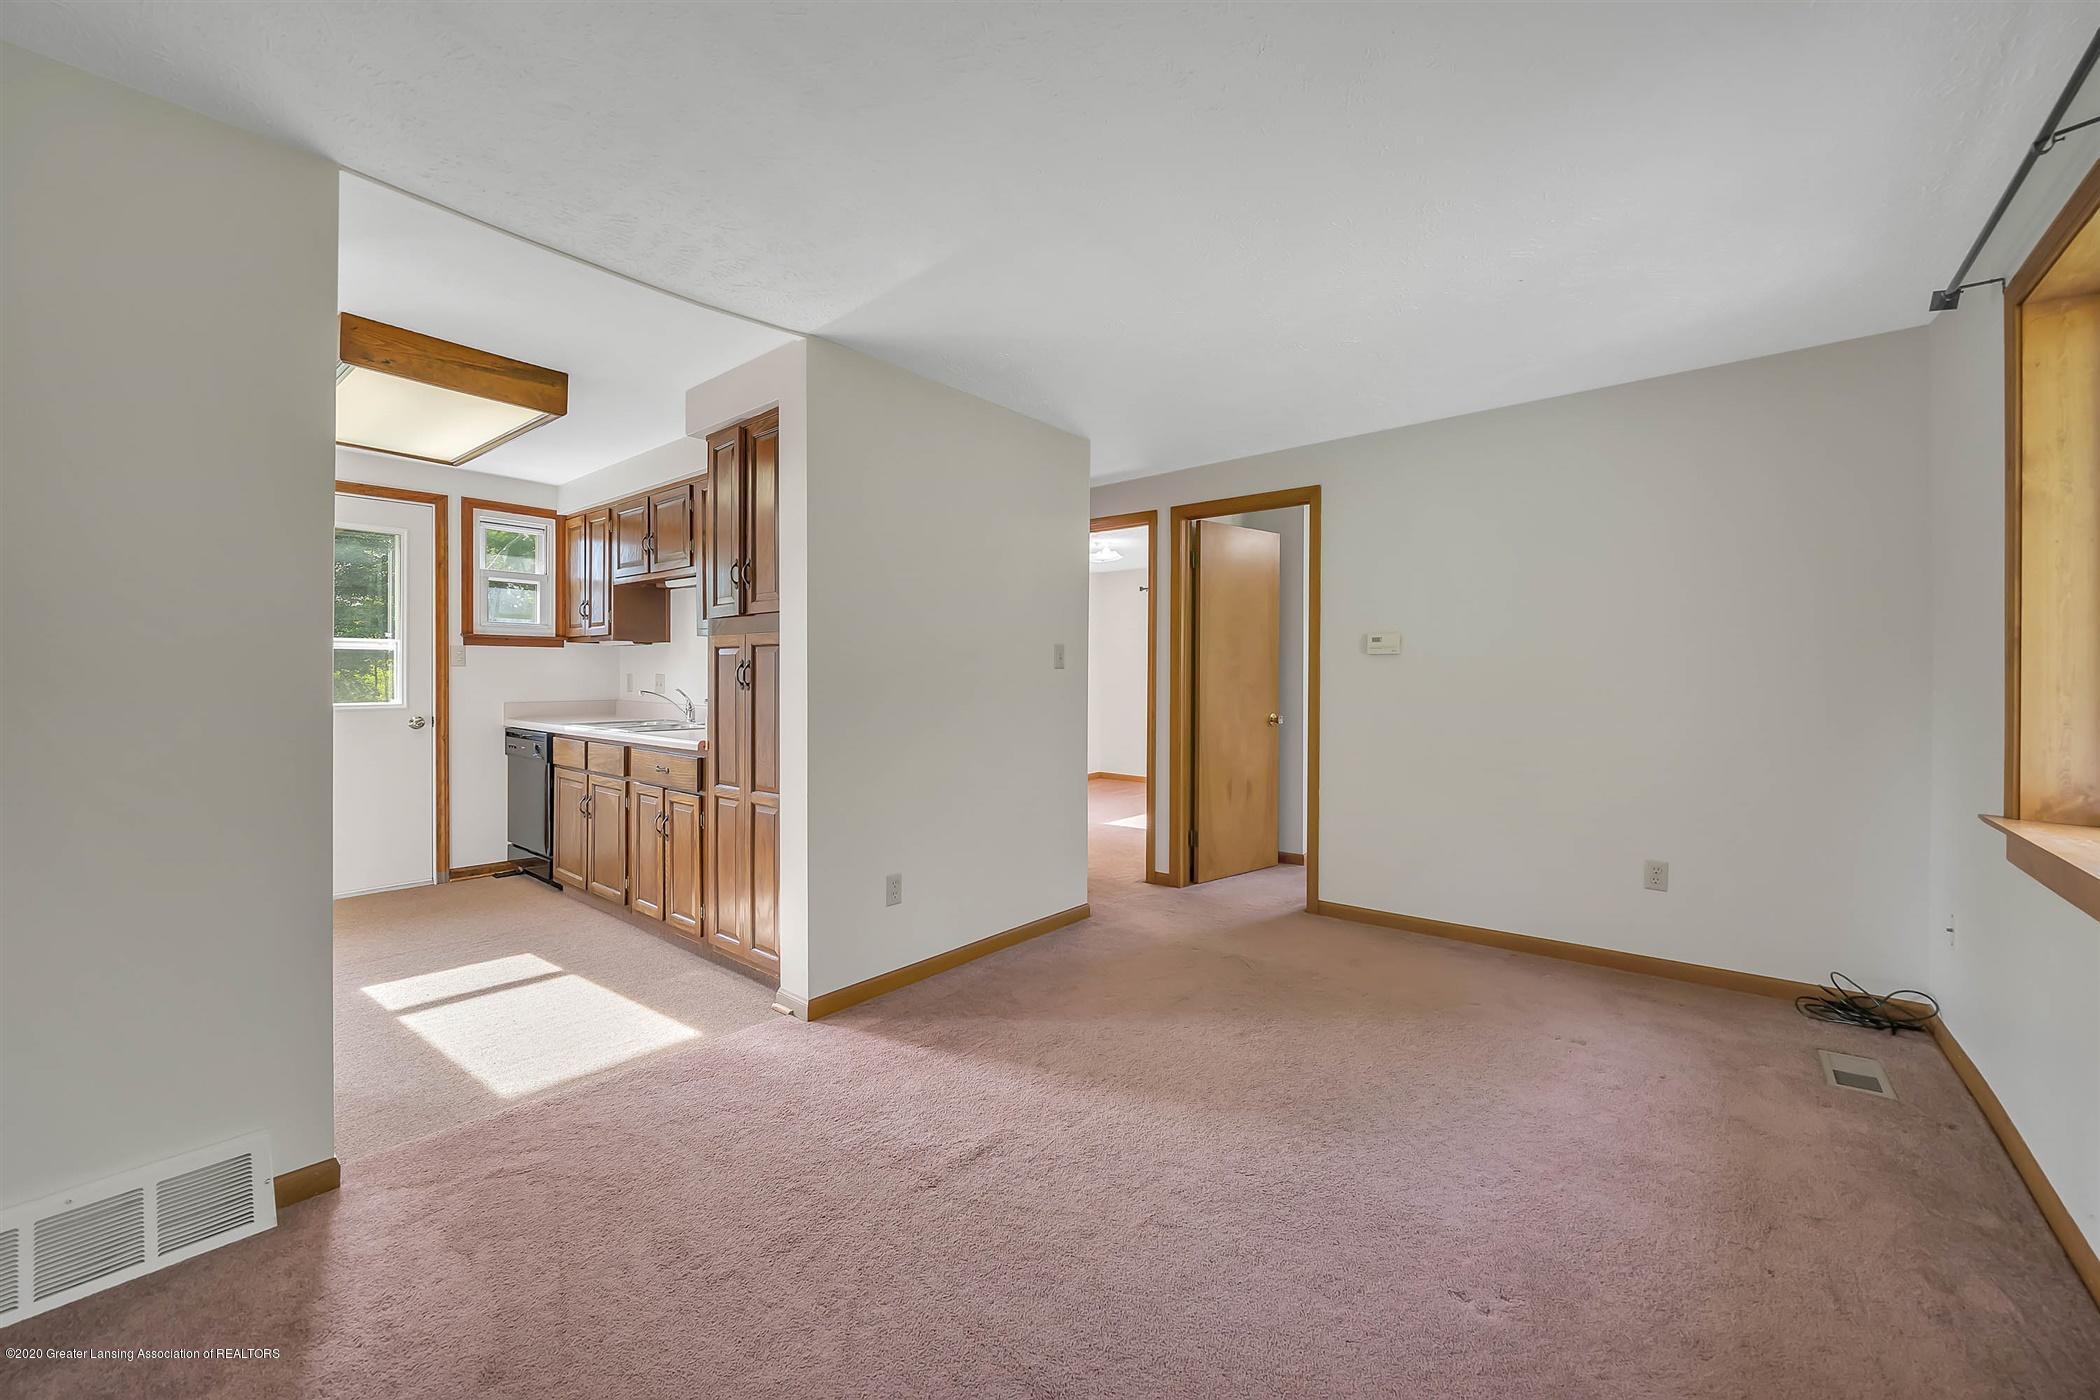 6750 W Lovejoy Rd - (22) 6756 Lovejoy Living Room - 22